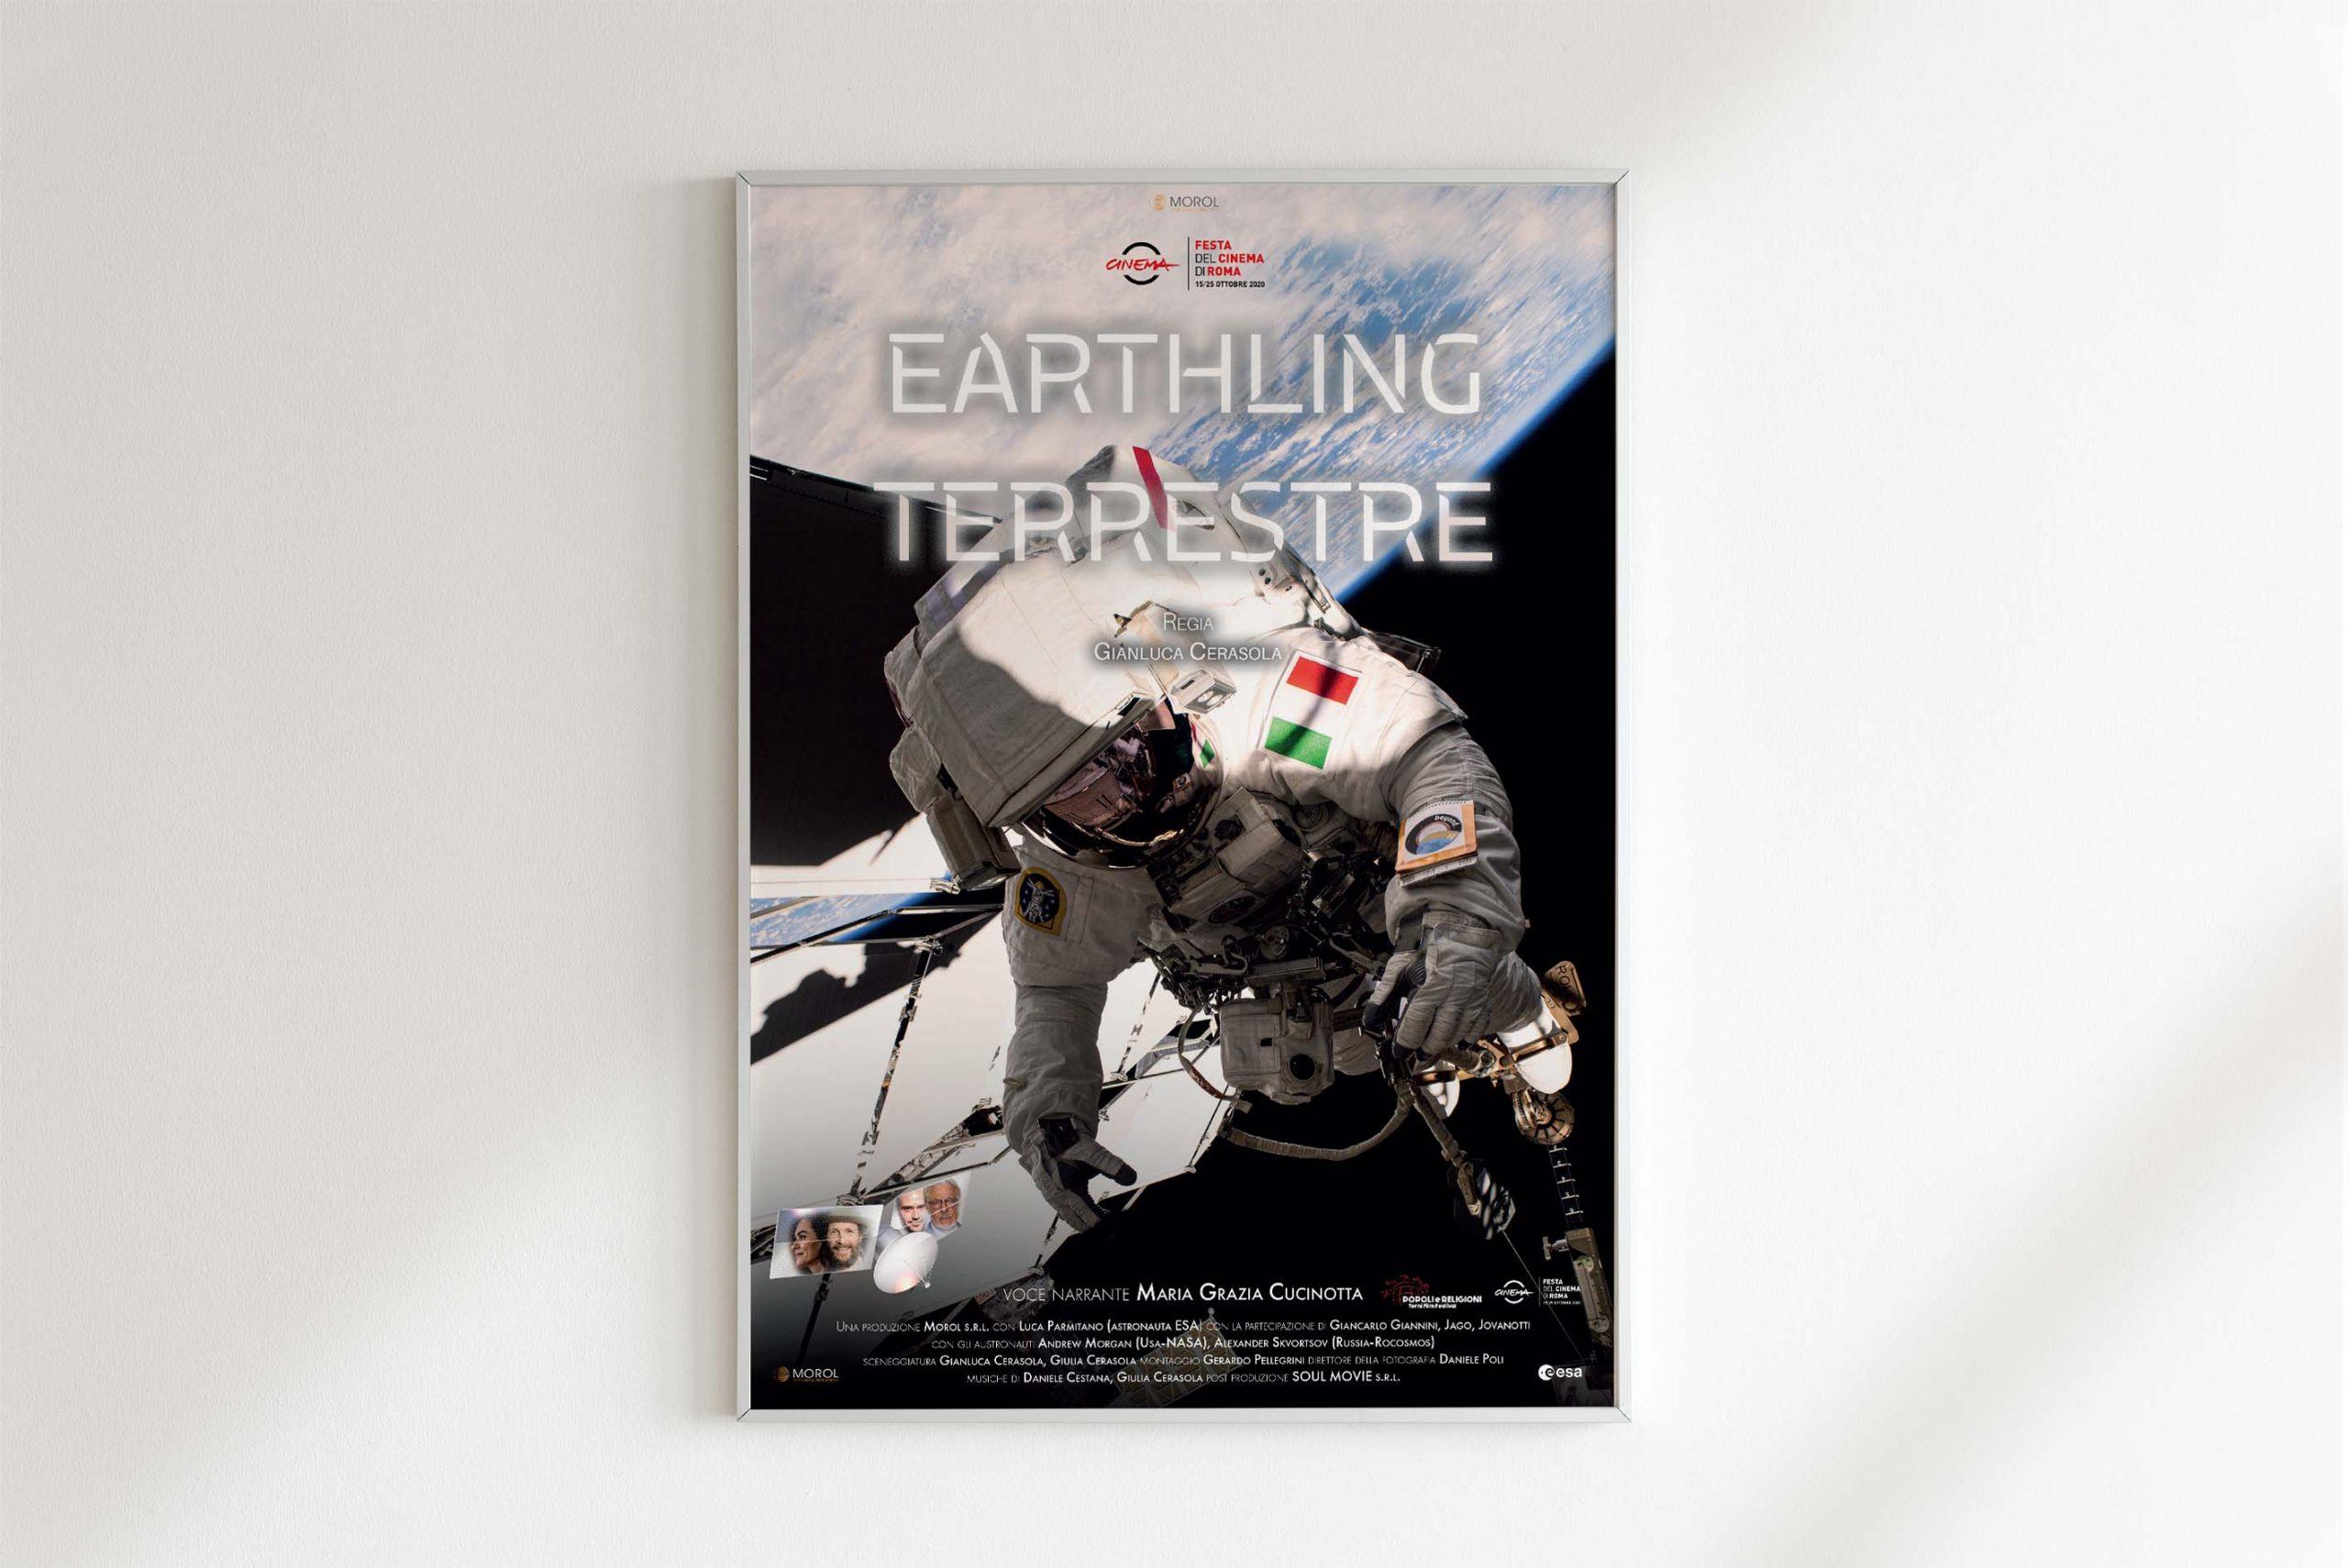 Earthling terrestre locandina